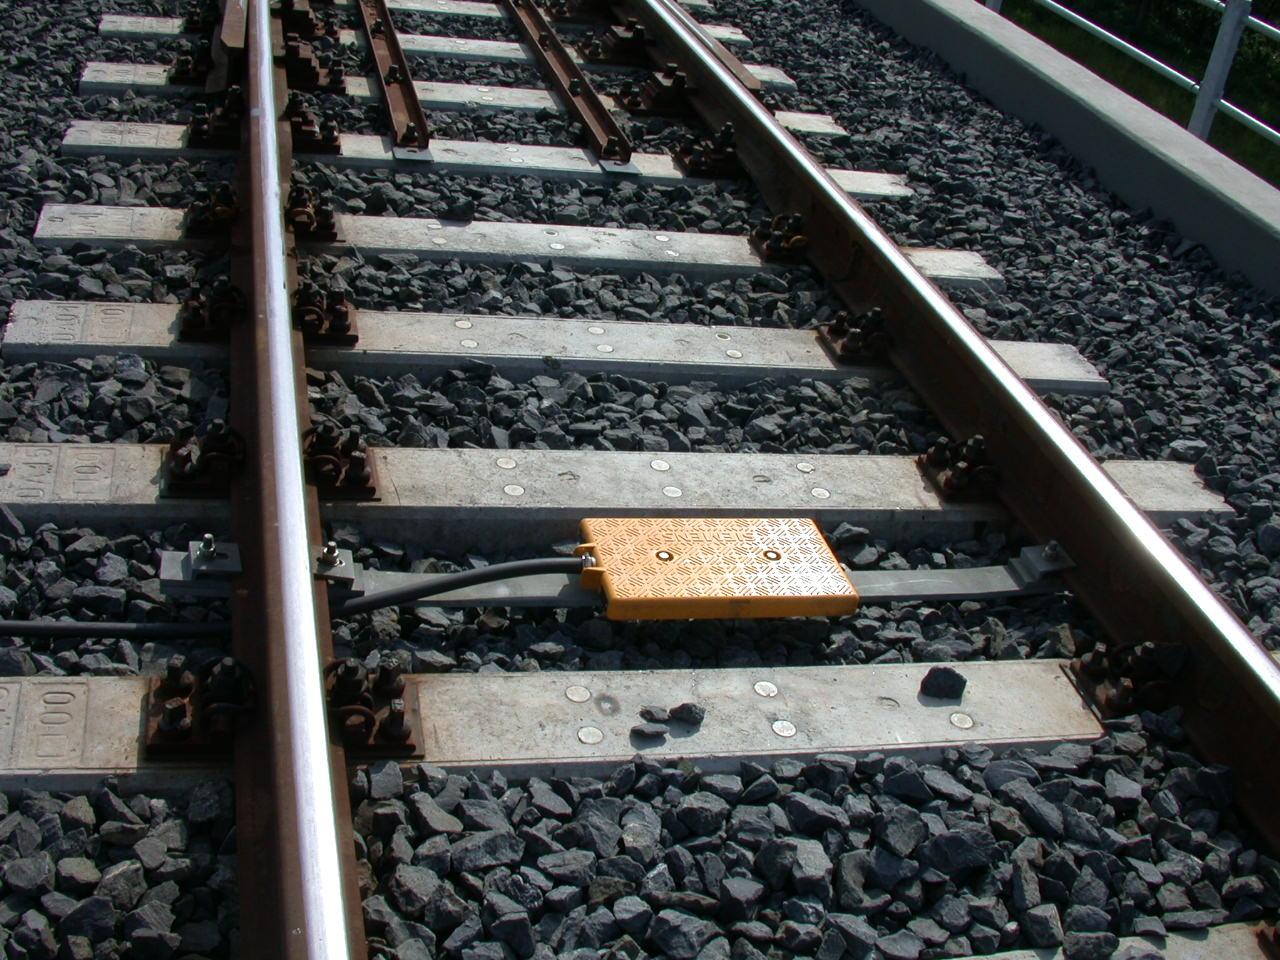 European Train Control System - Wikipedia